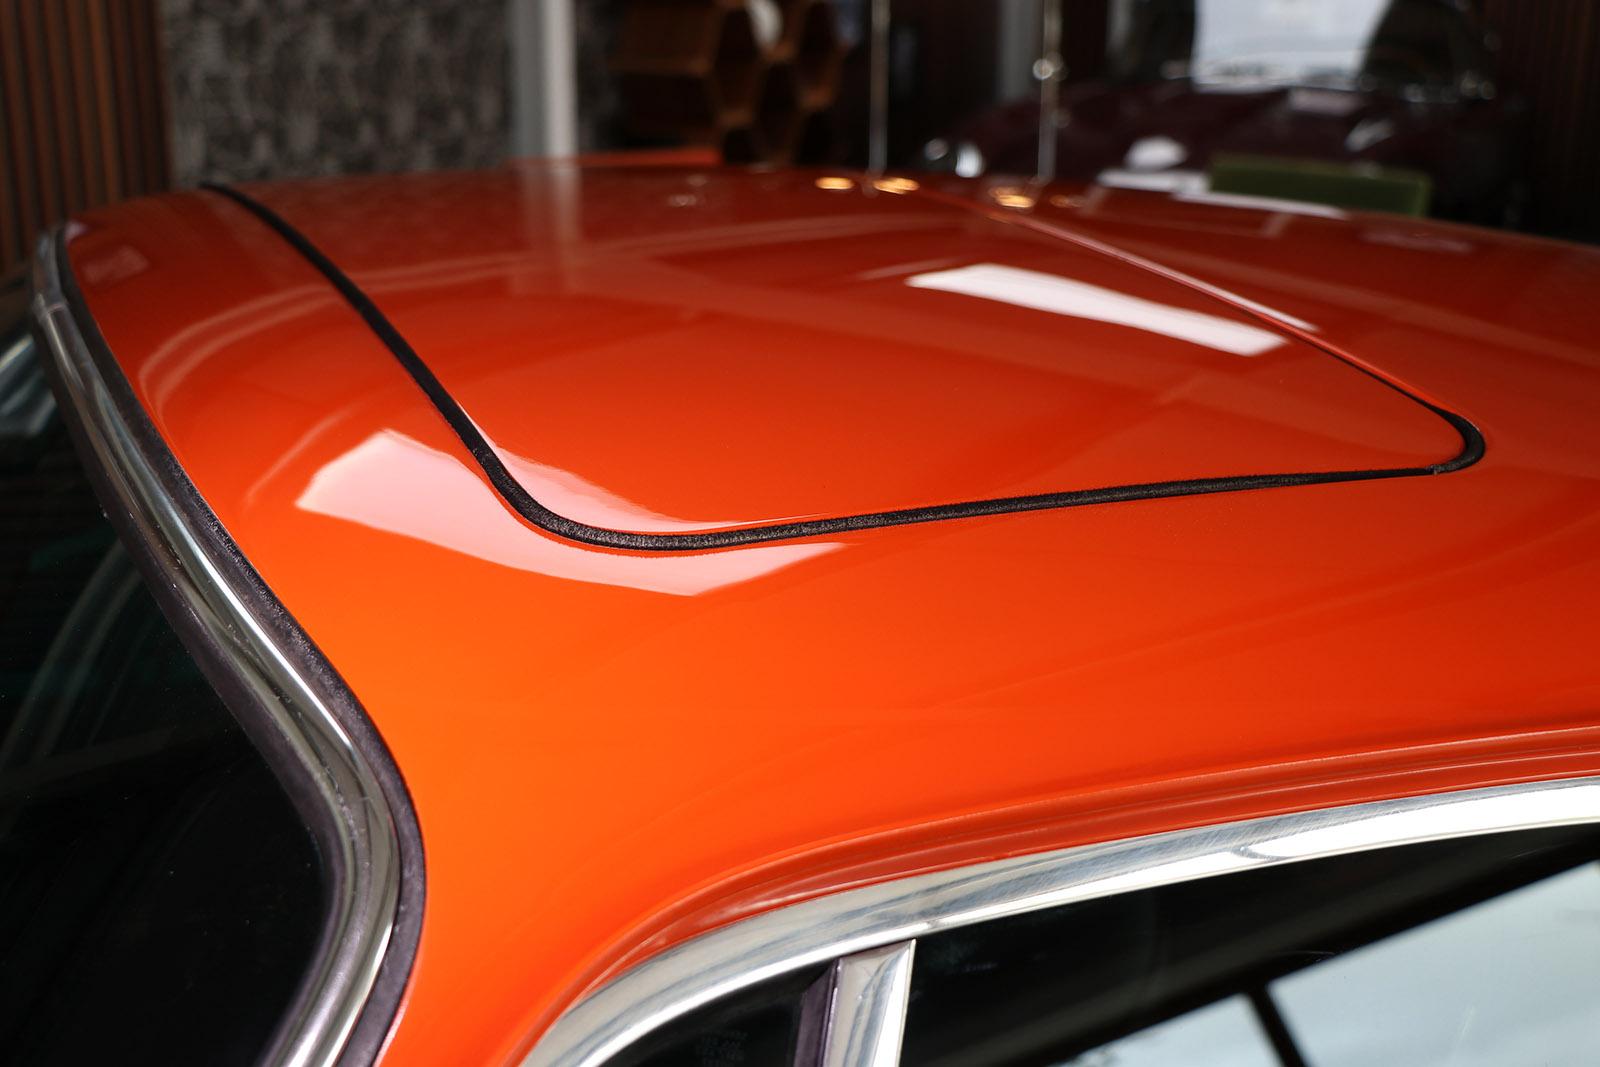 1972-Porsche 911 S-orange-evocation-sayer selection-9-web.jpg